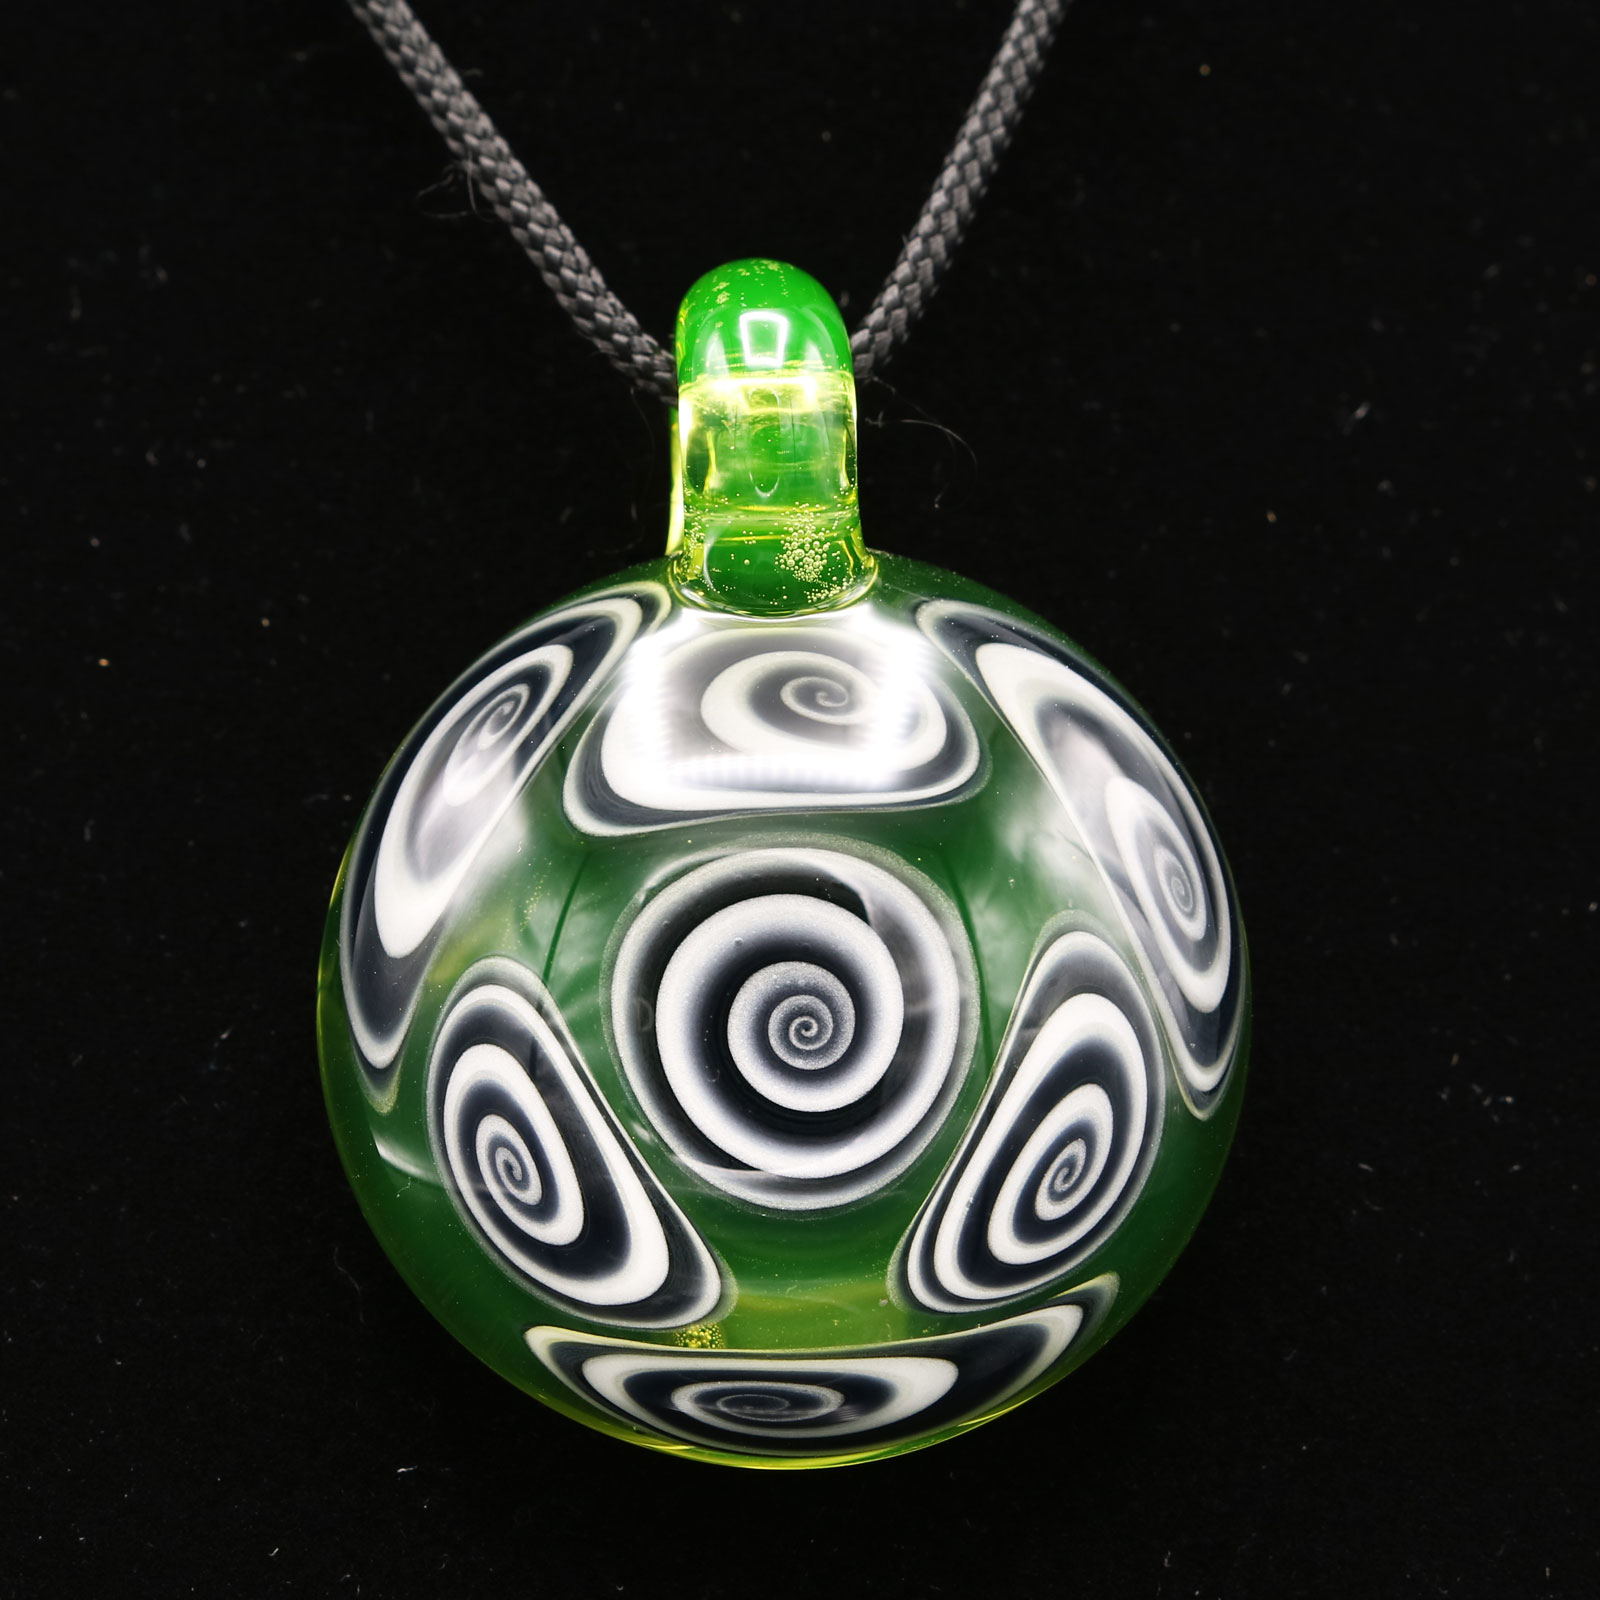 heady glass pendants - Heady Glass Pendants